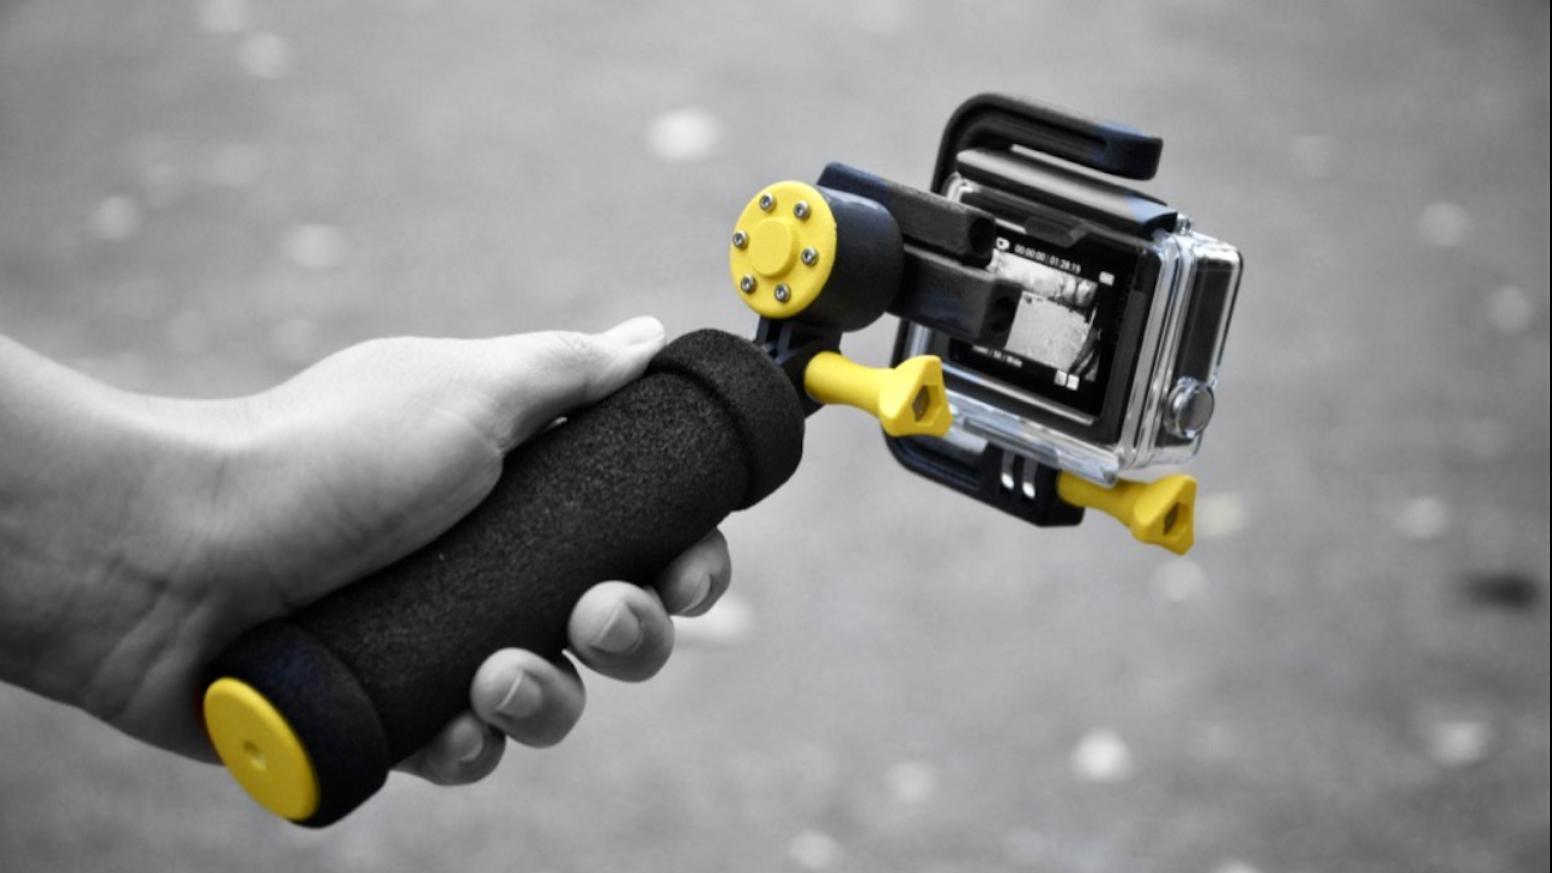 Make smooth videos with an innovative steadycam. Waterproof mechanical gimbal.